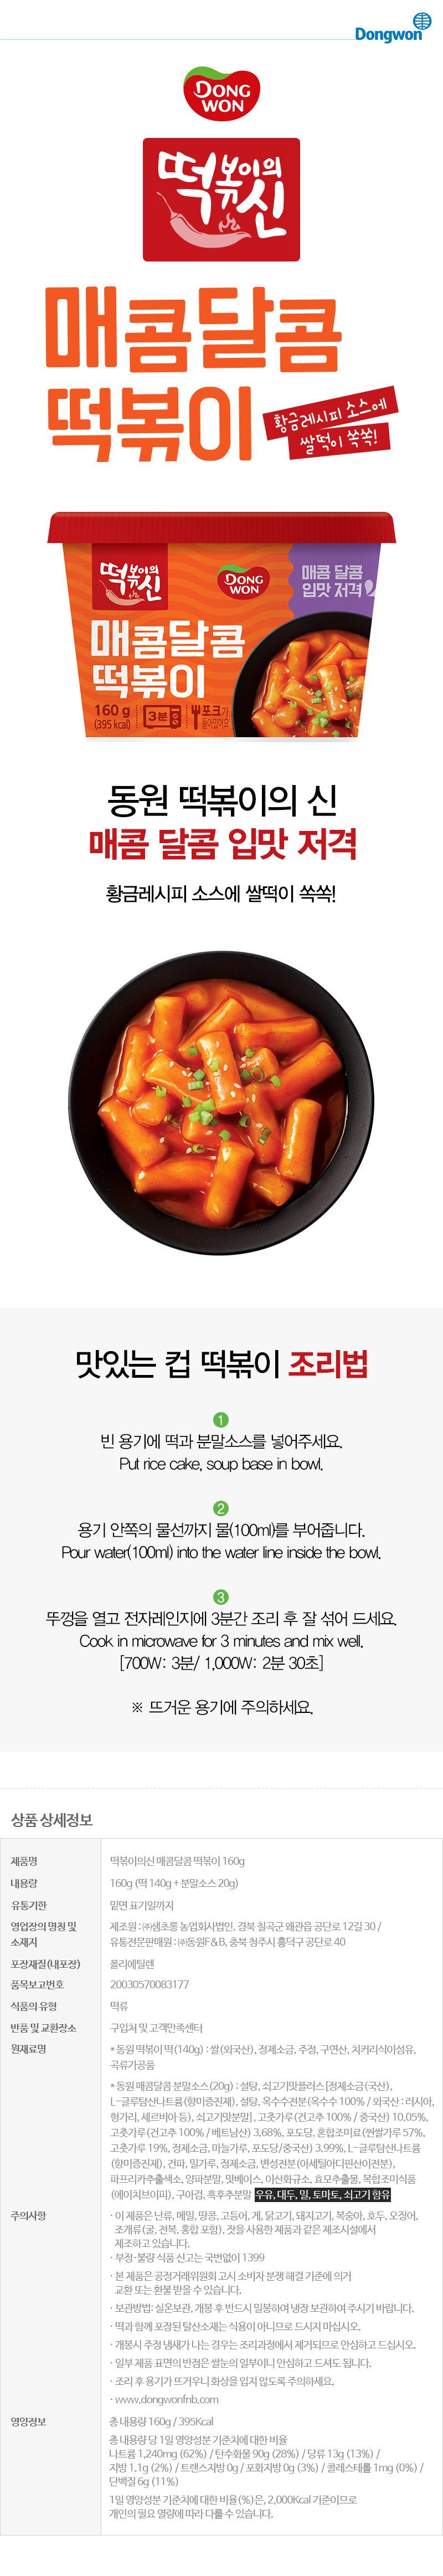 2020_dongwon_28.jpg